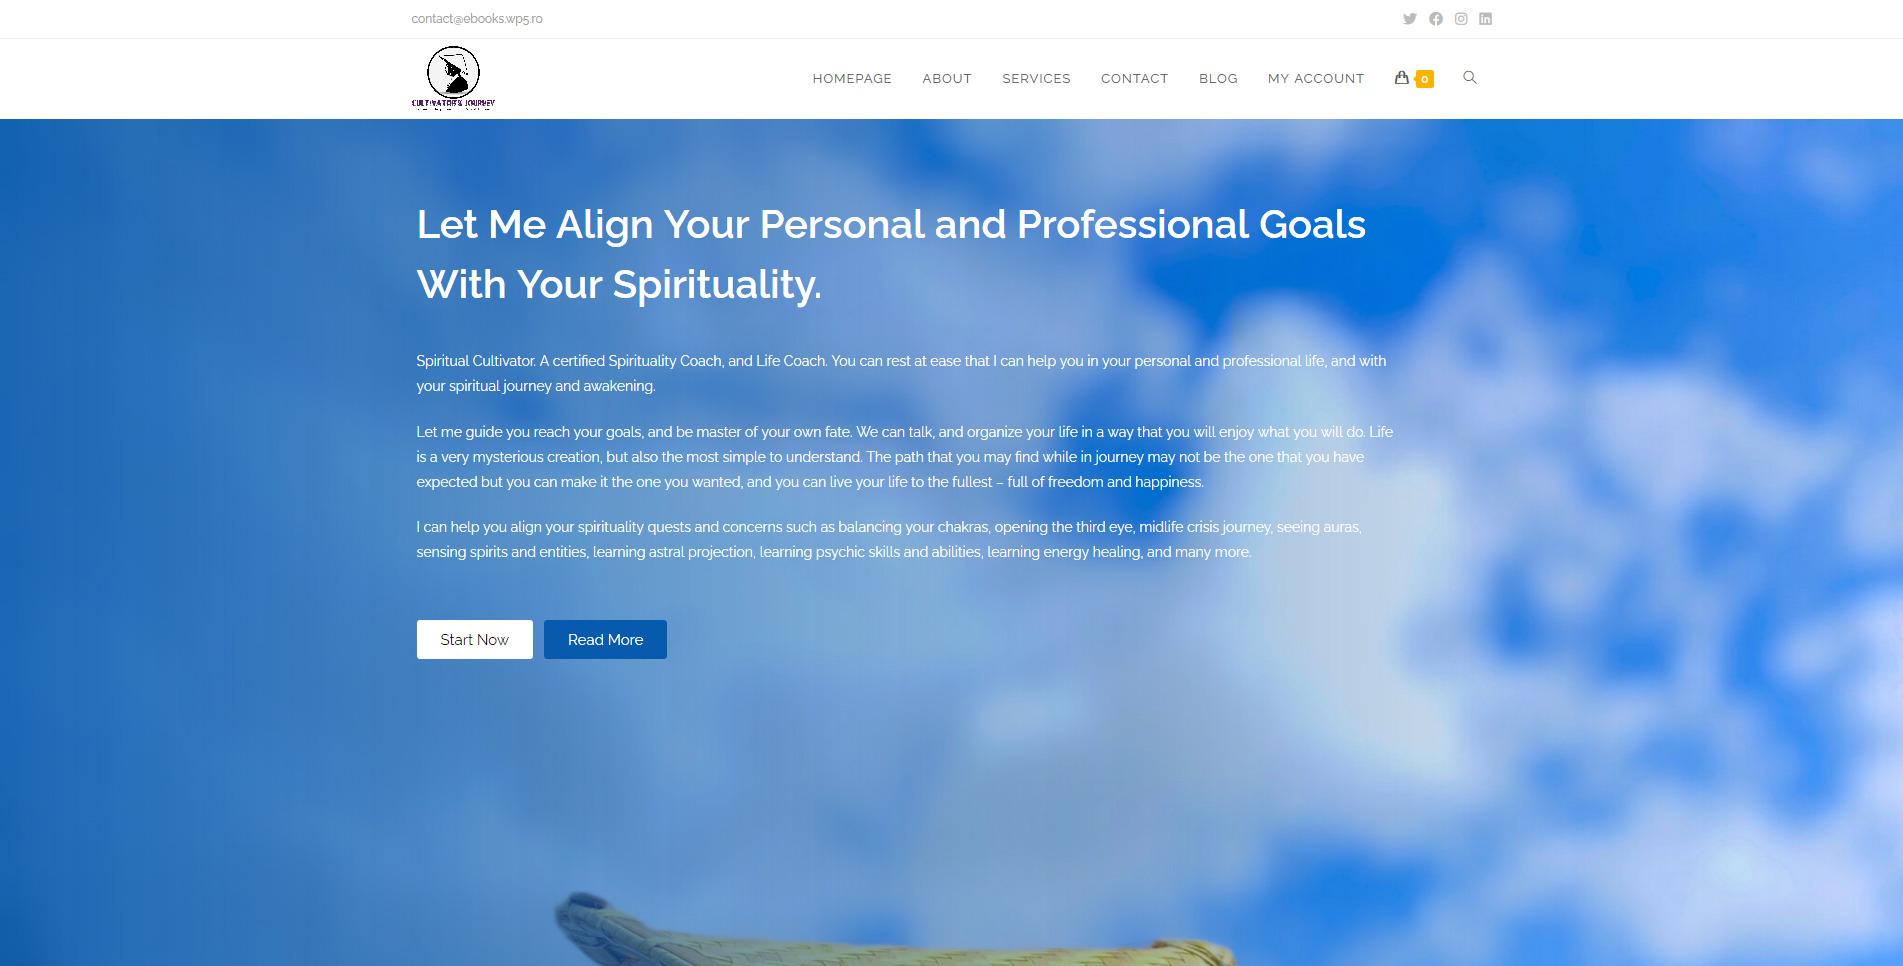 Spirituality Coach